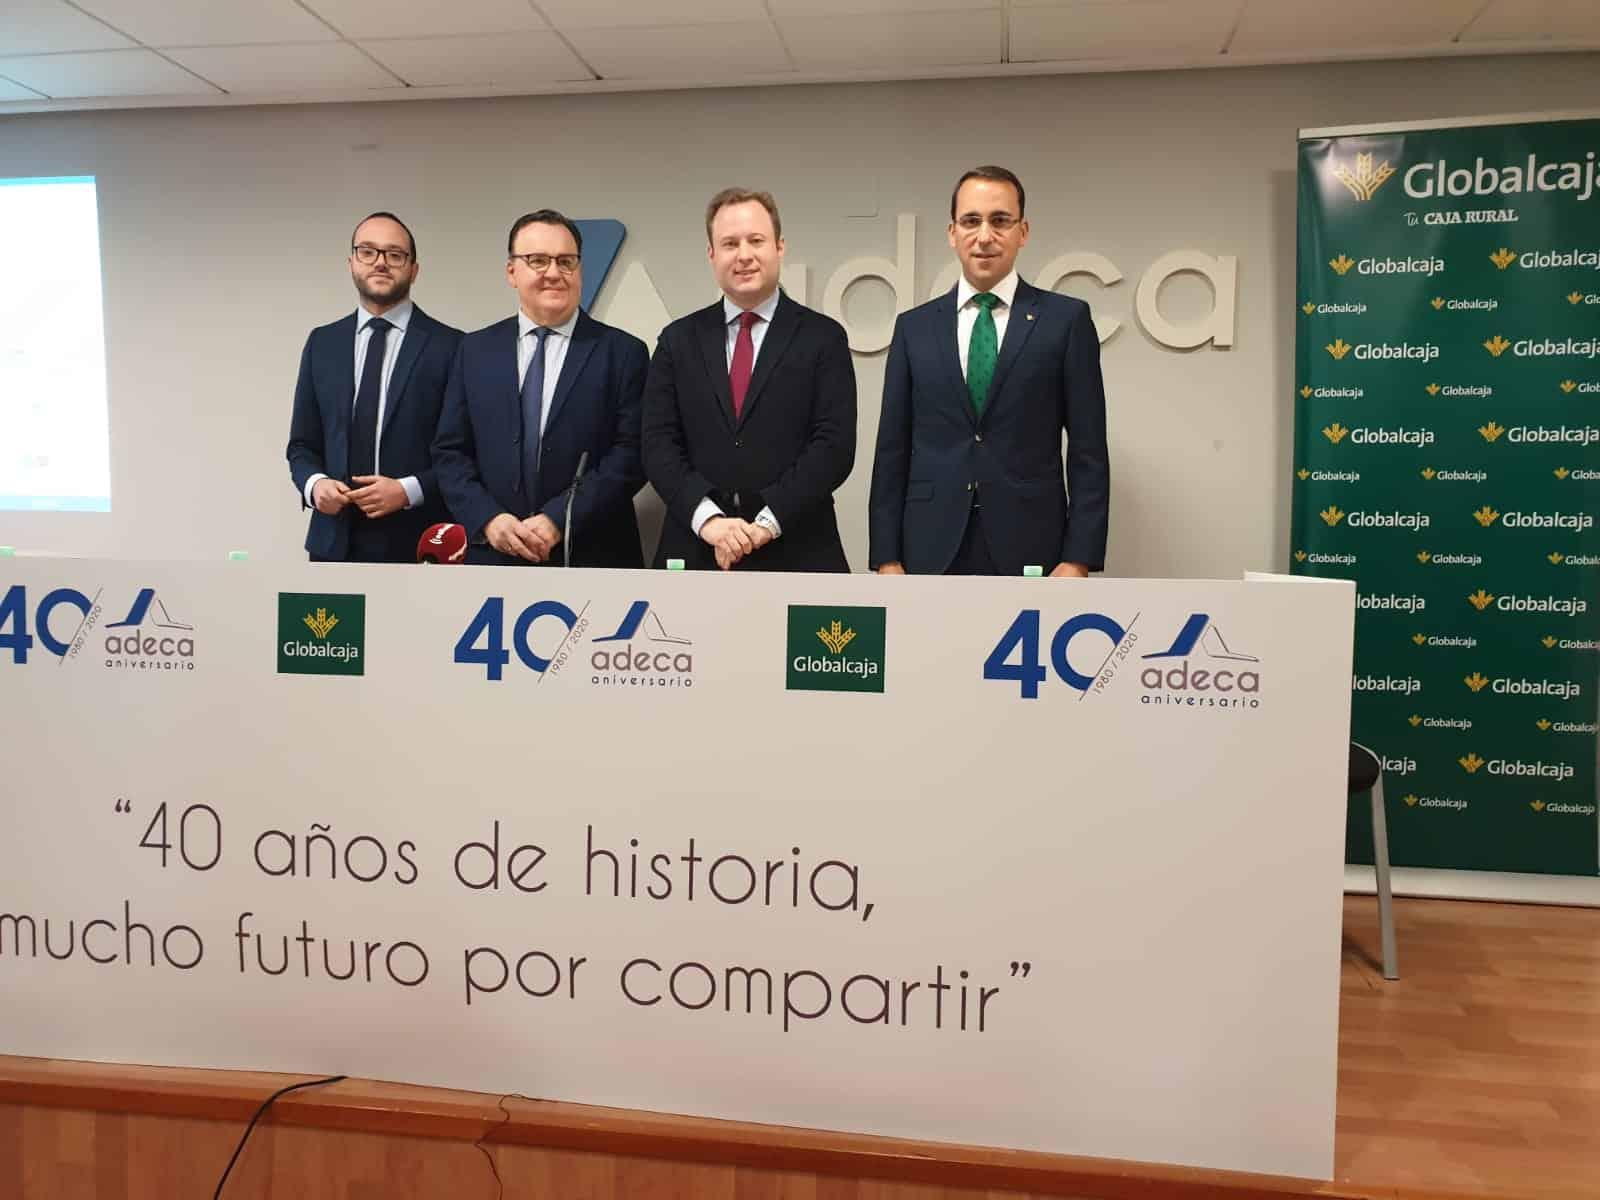 https://blog.globalcaja.es/wp-content/uploads/2020/01/40-aniversario-adeca-1.jpeg